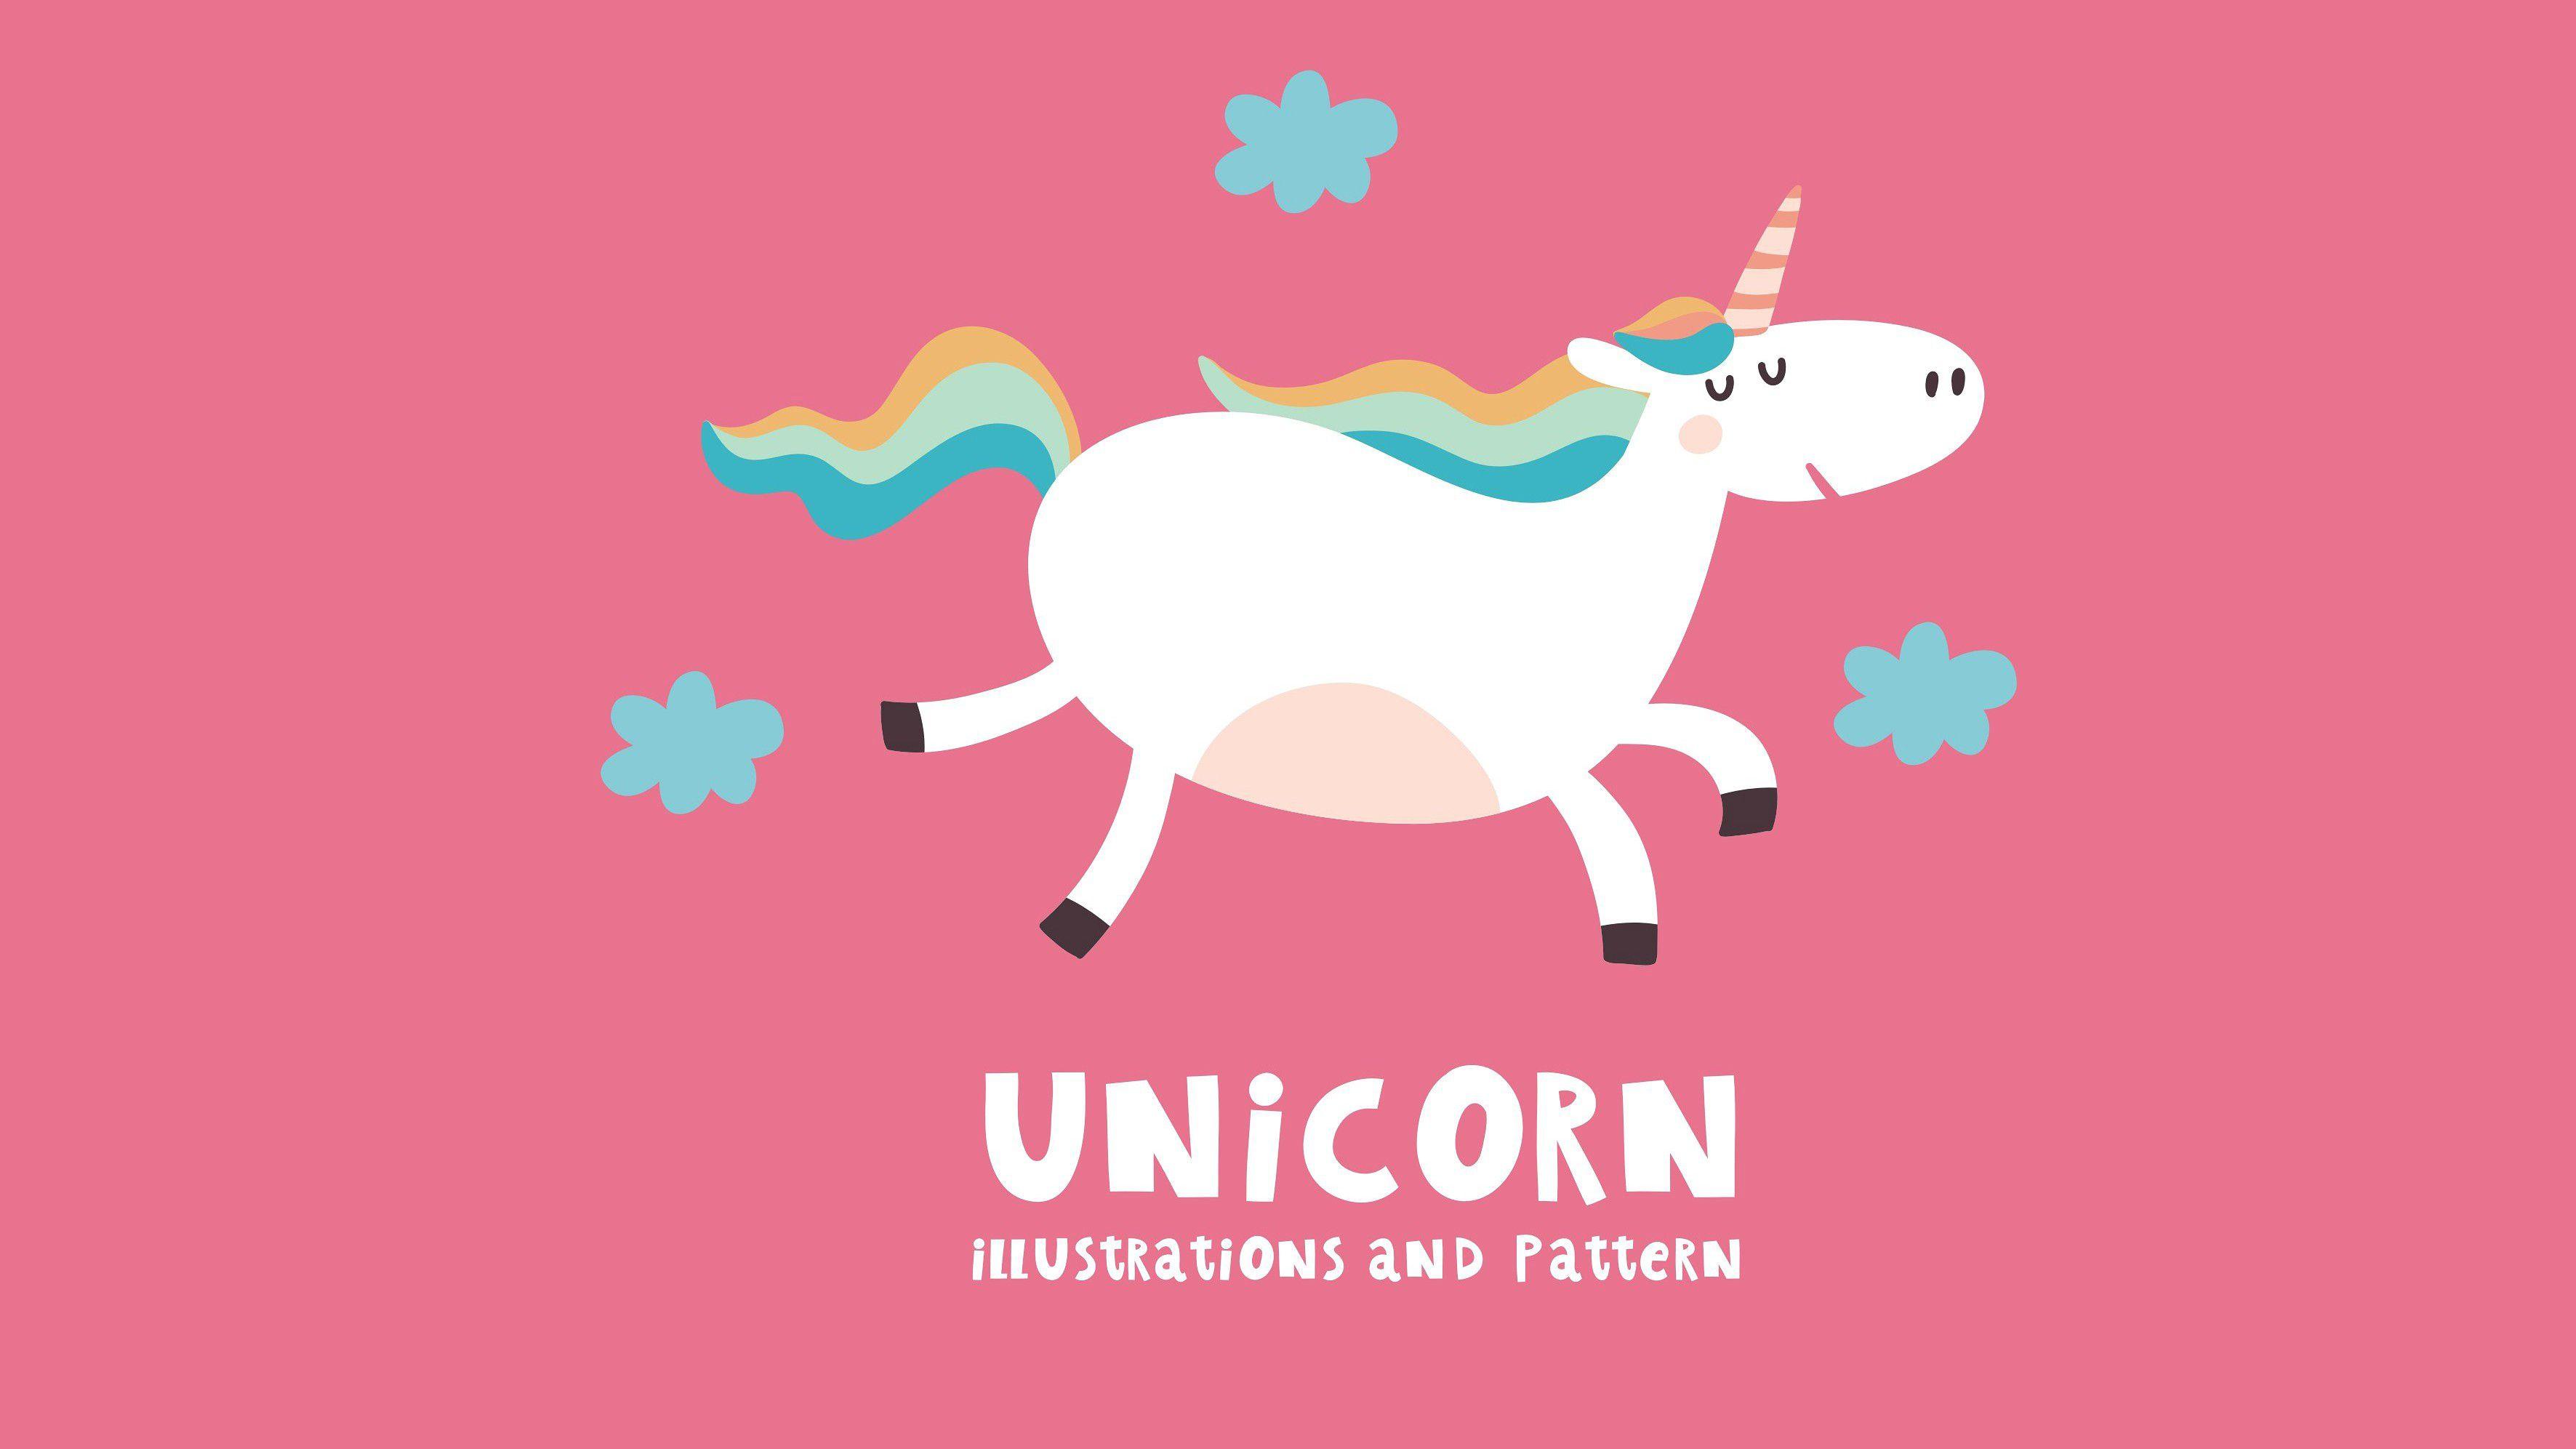 Funny Unicorn Desktop Background 93005 Hd Wallpaper Backgrounds Download